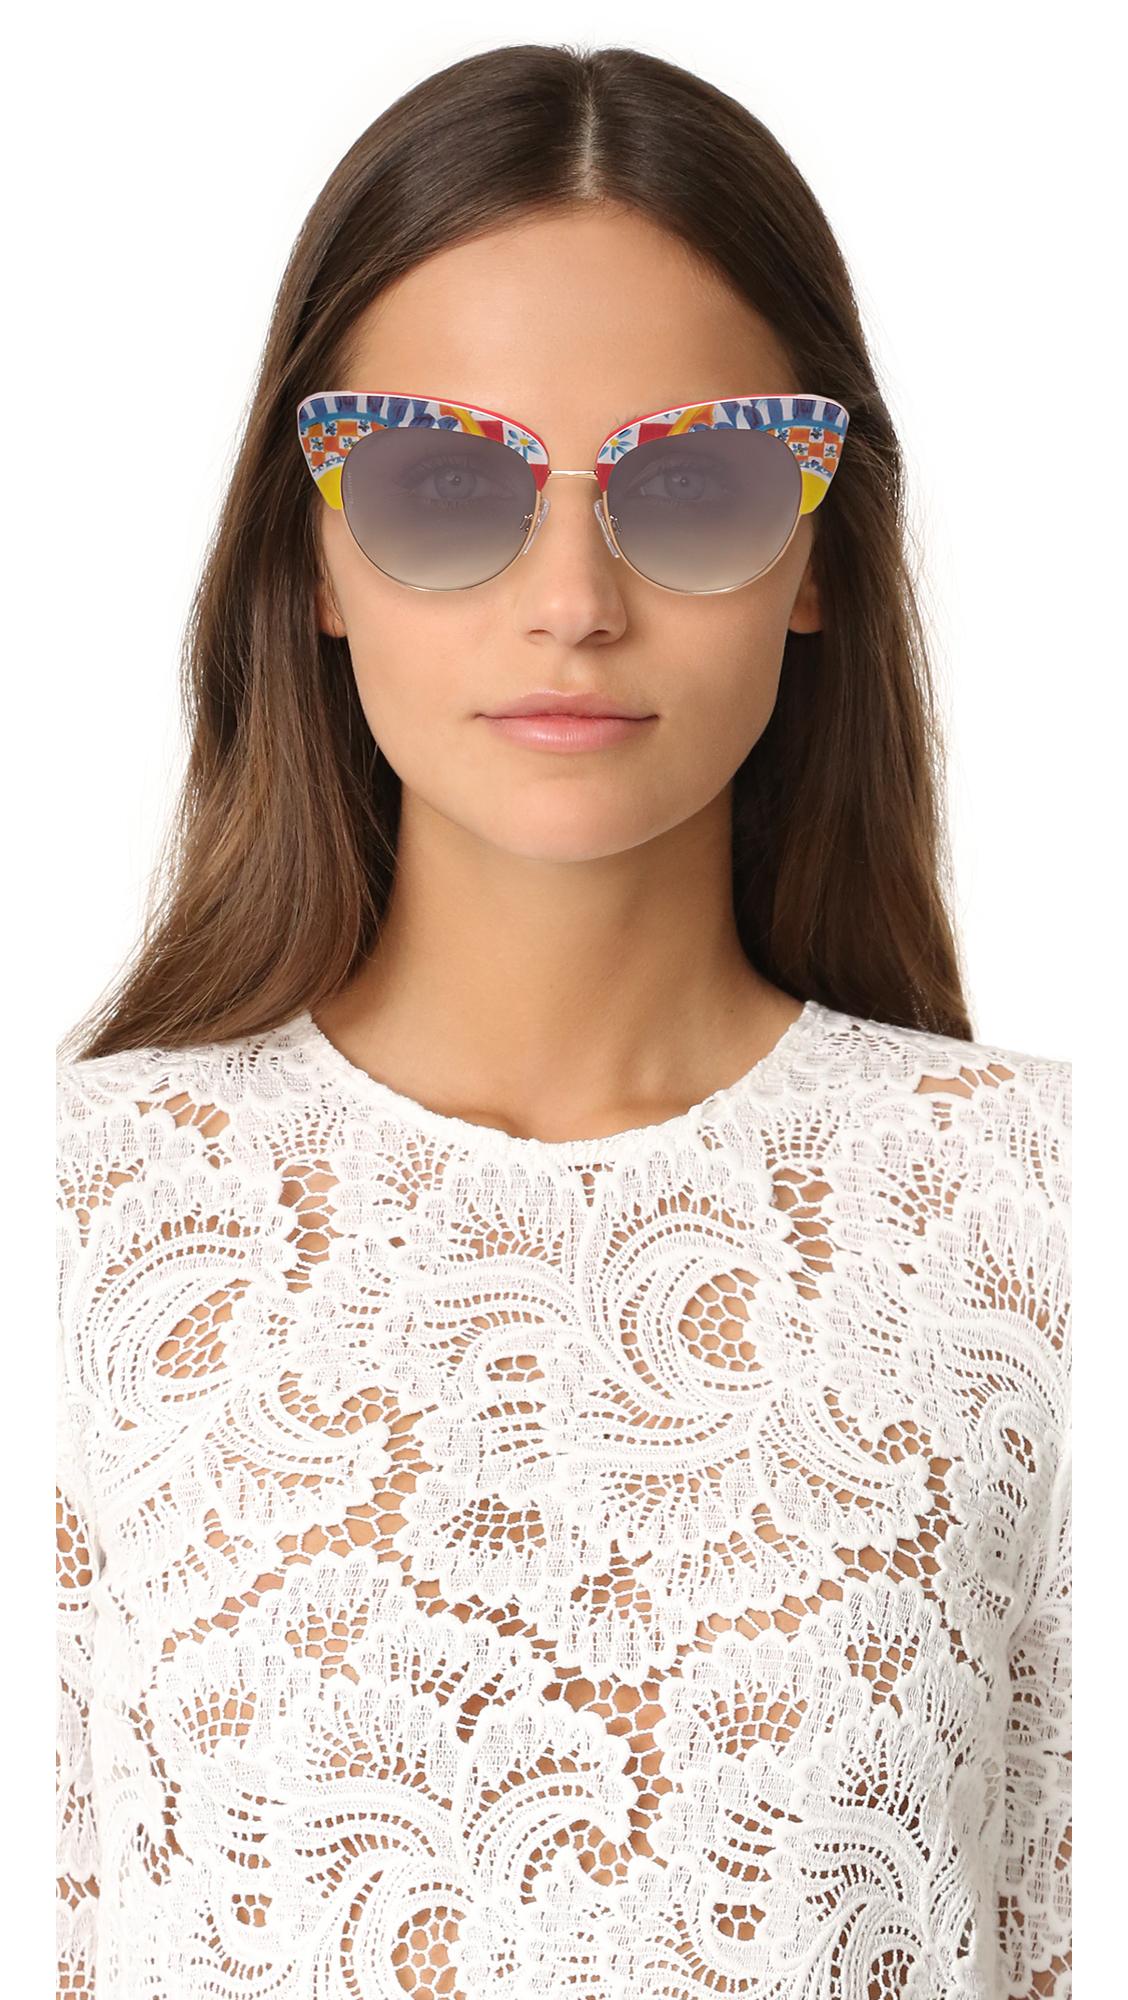 c99b2be9a11c Dolce   Gabbana Mambo Cat Eye Sunglasses